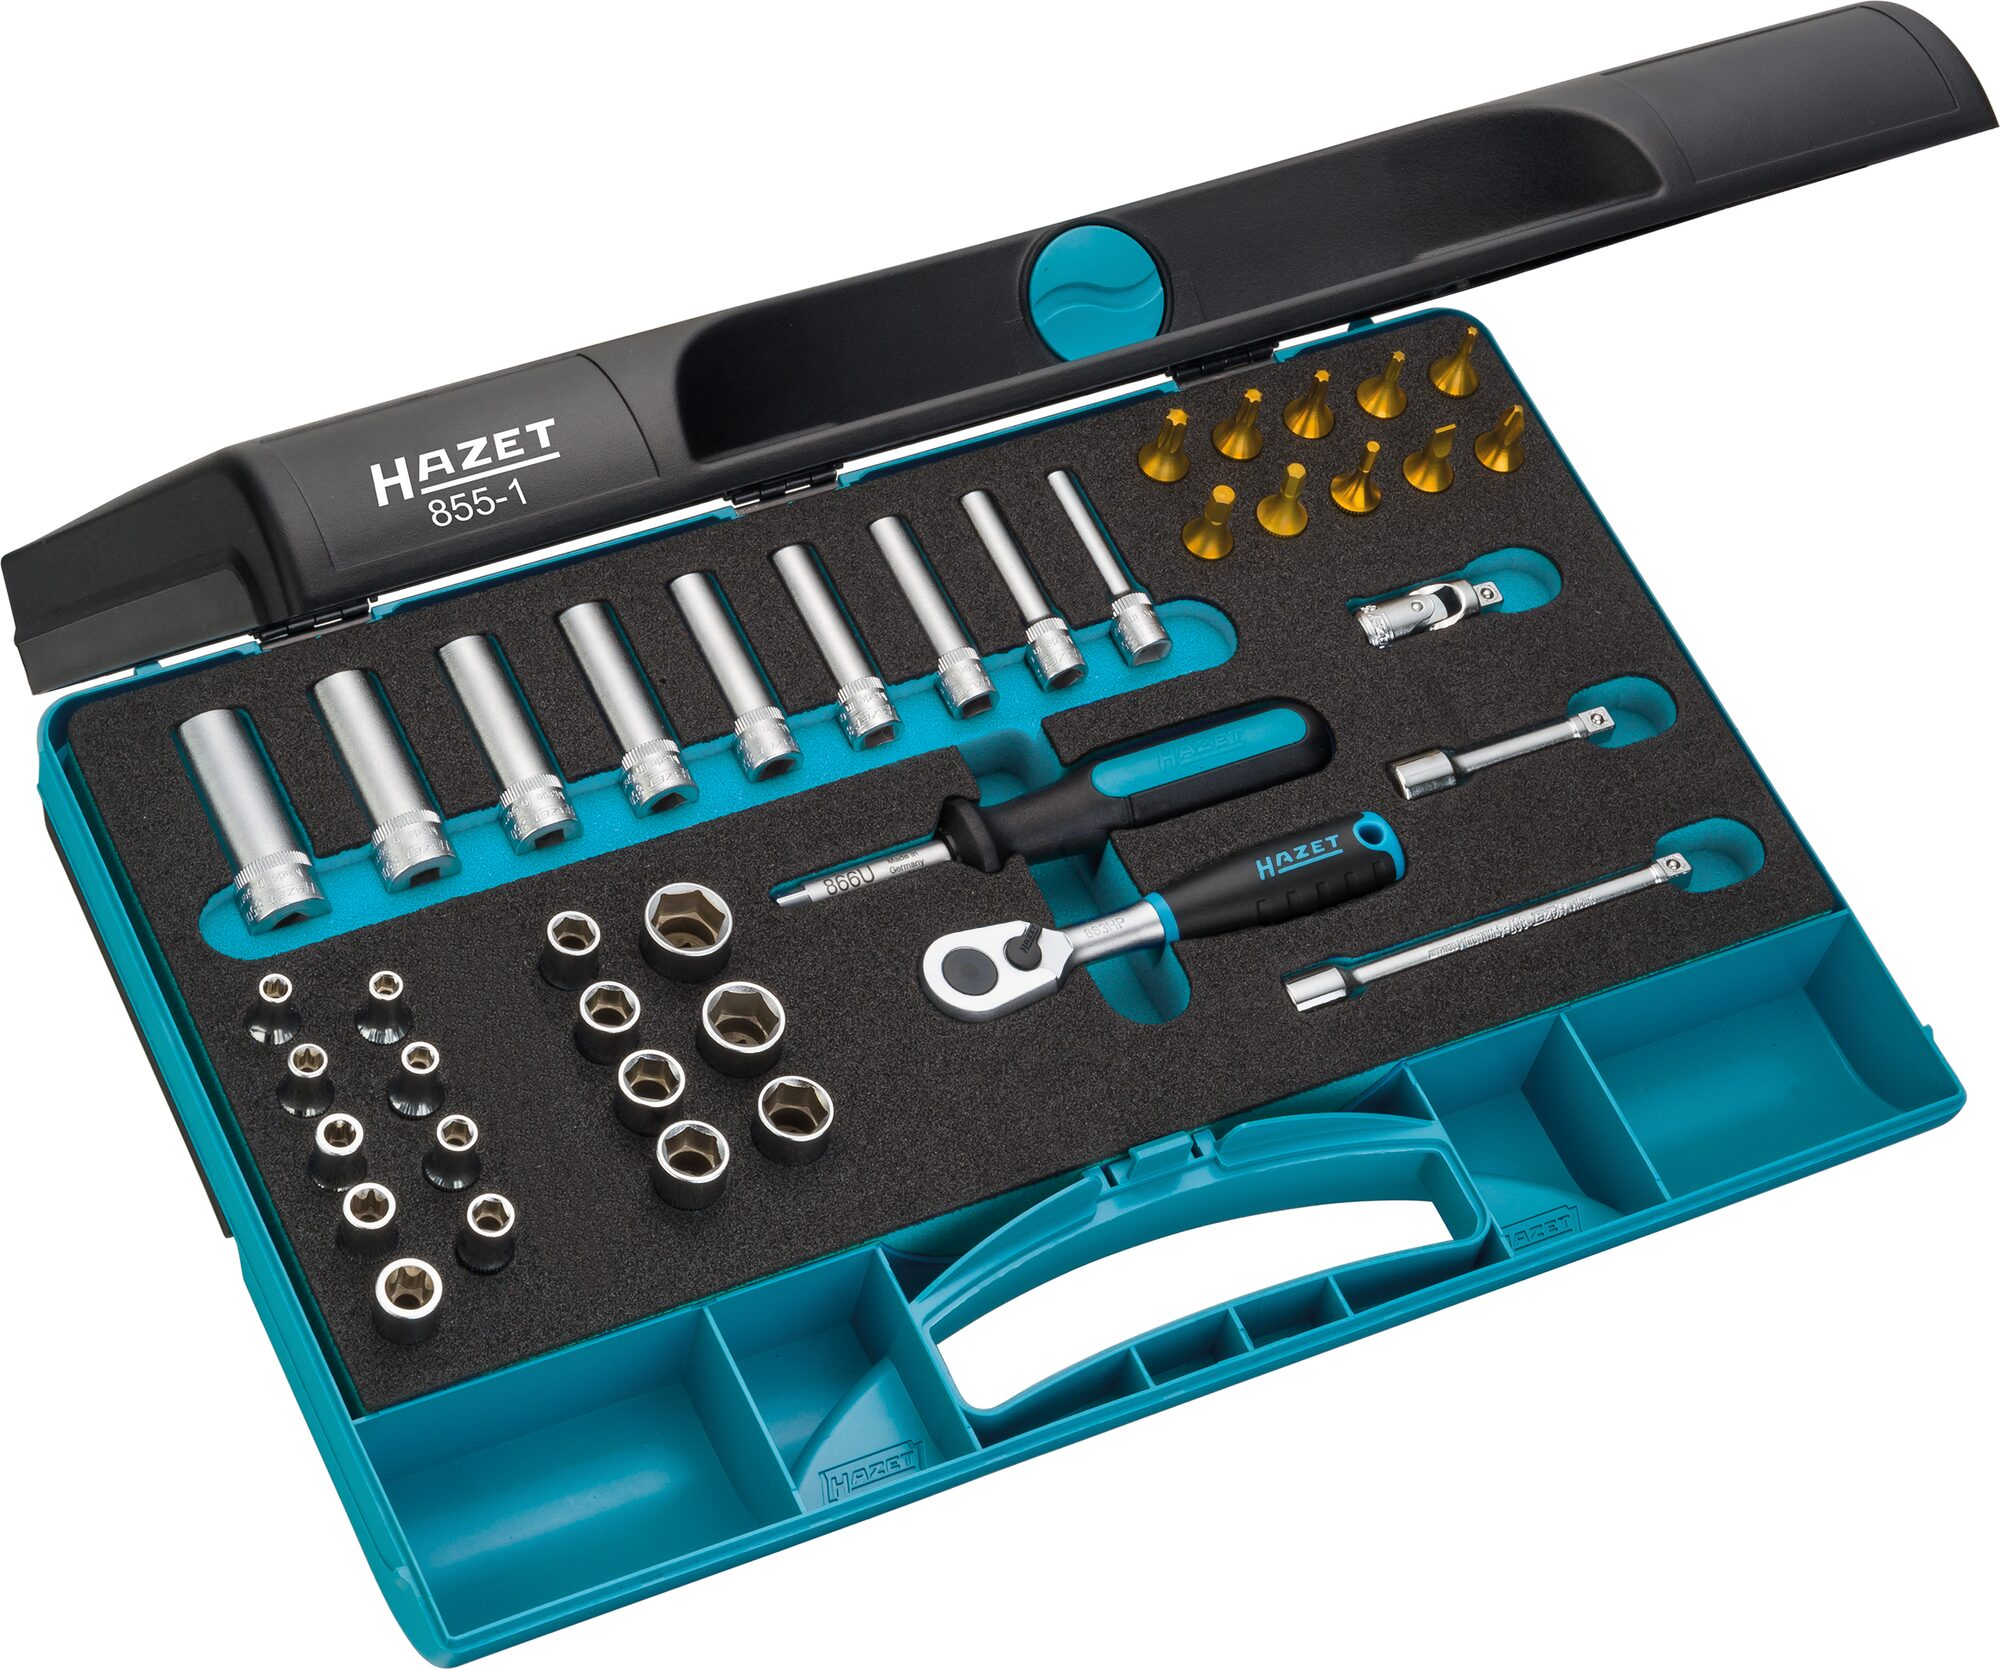 HAZET Steckschlüssel Satz 855-1 ∙ Vierkant hohl 6,3 mm (1/4 Zoll) ∙ Anzahl Werkzeuge: 40